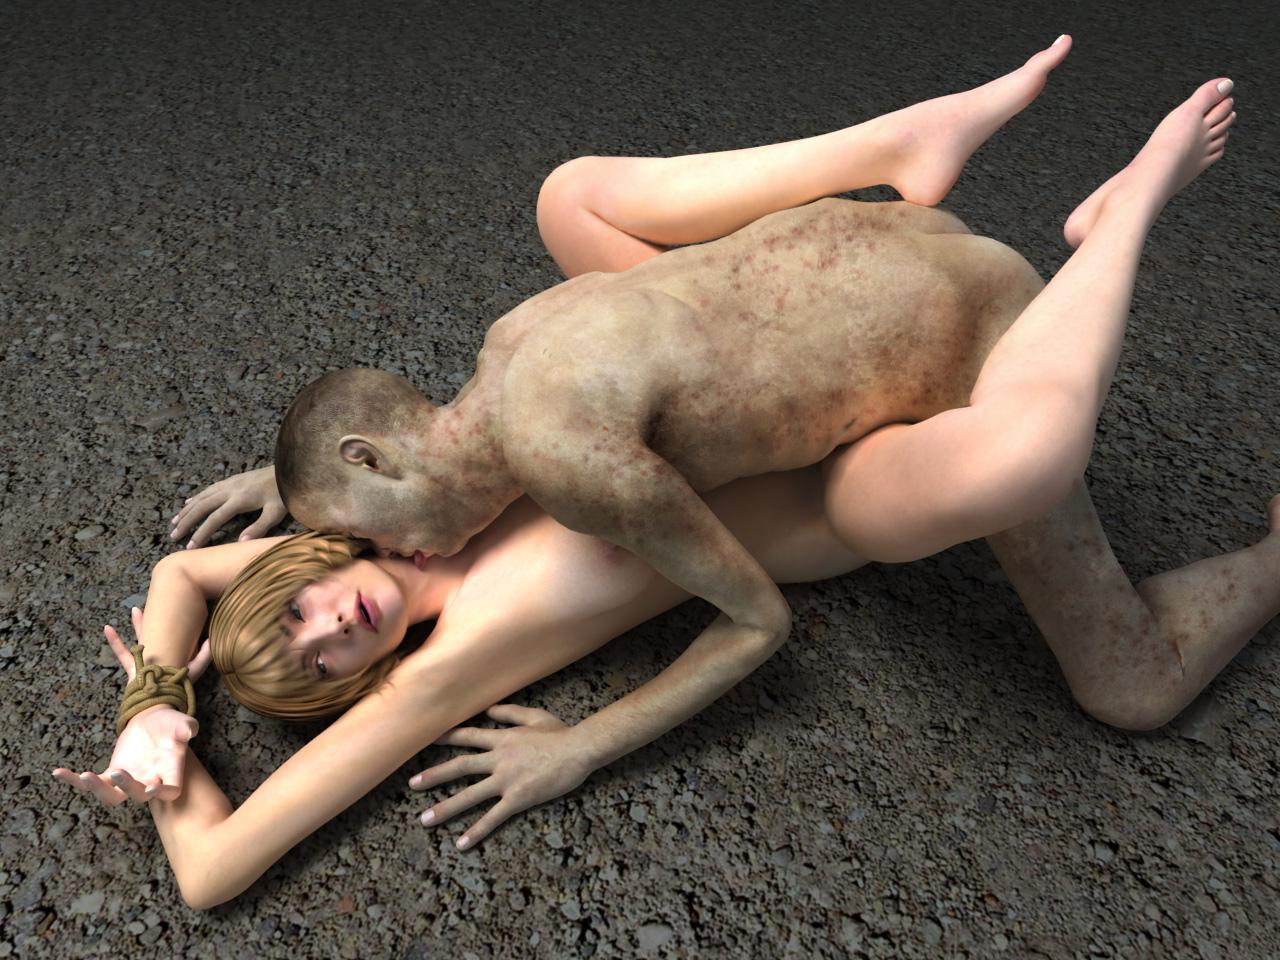 massage sex pig porn one night sex girl